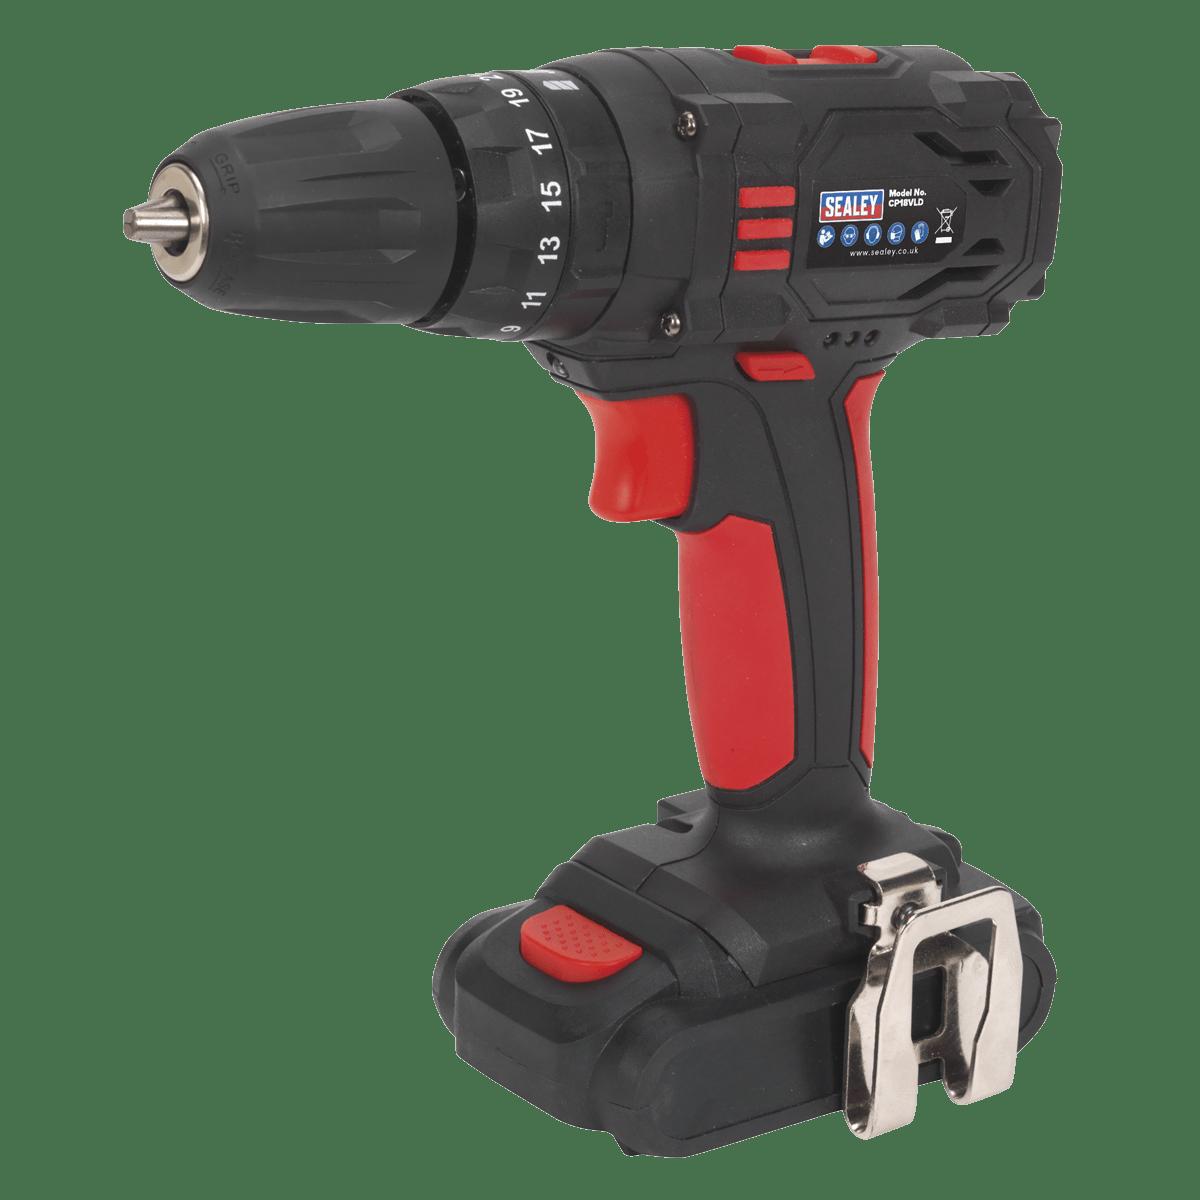 Sealey Cordless Hammer Drill/Driver Ø10mm 18V 1.5Ah Lithium-ion 2-S CP18VLD